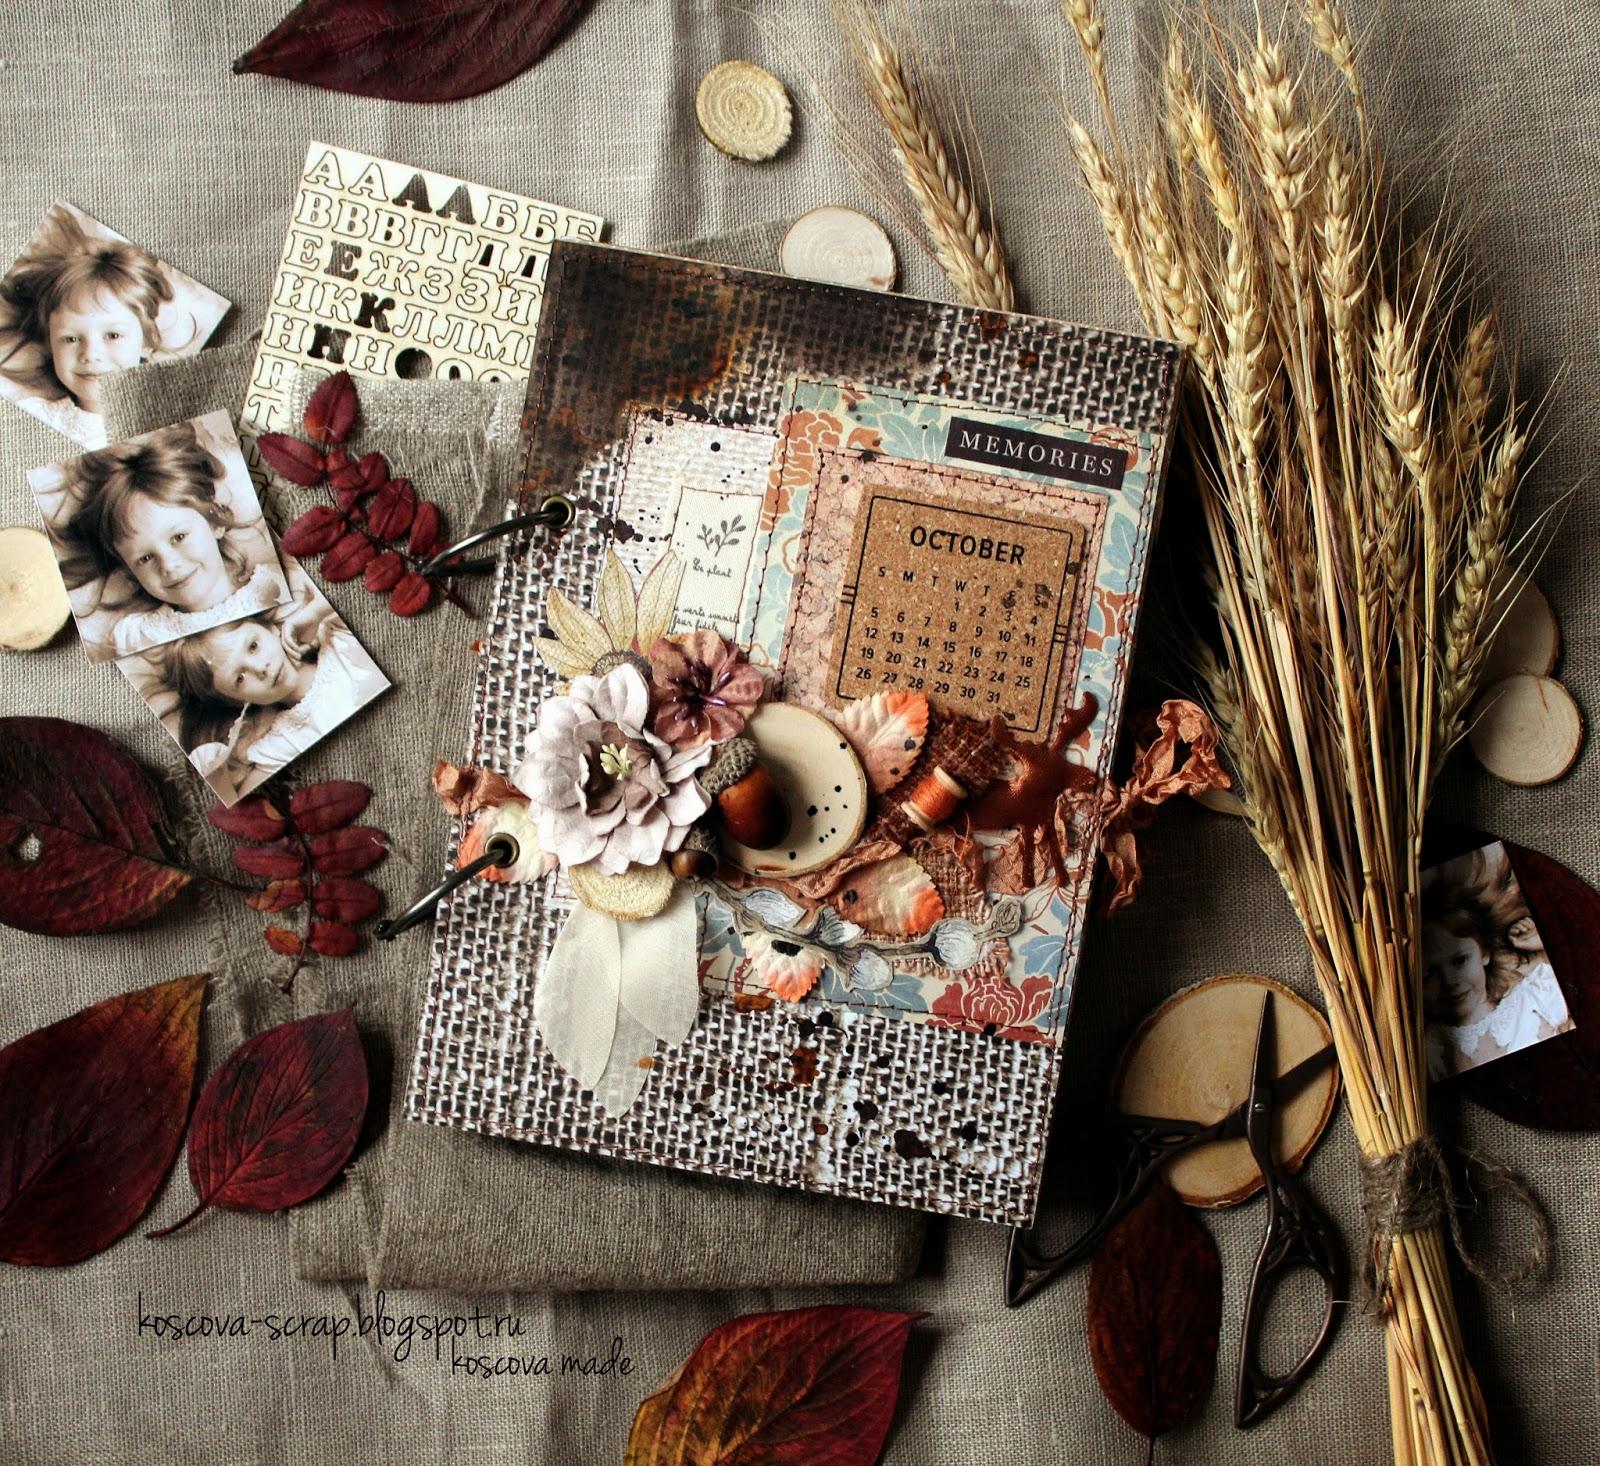 Картинки на обложку альбома об осени